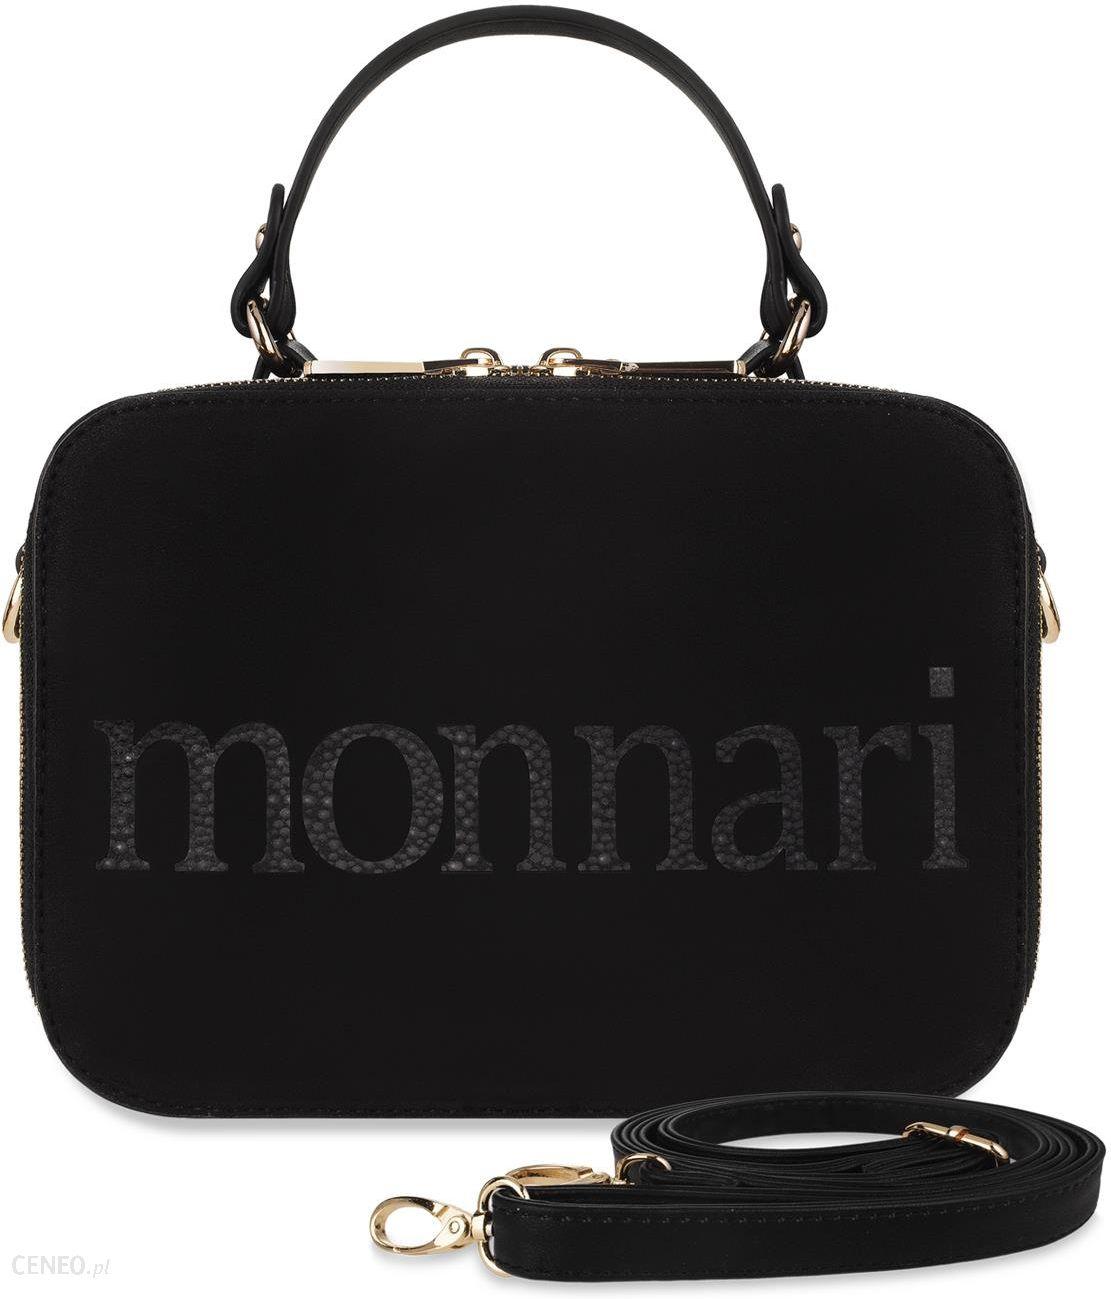 cb3461cbe4452 Dwukomorowy kuferek monnari torebka damska listonoszka do ręki i na ramię  nubuk logo - czarny -